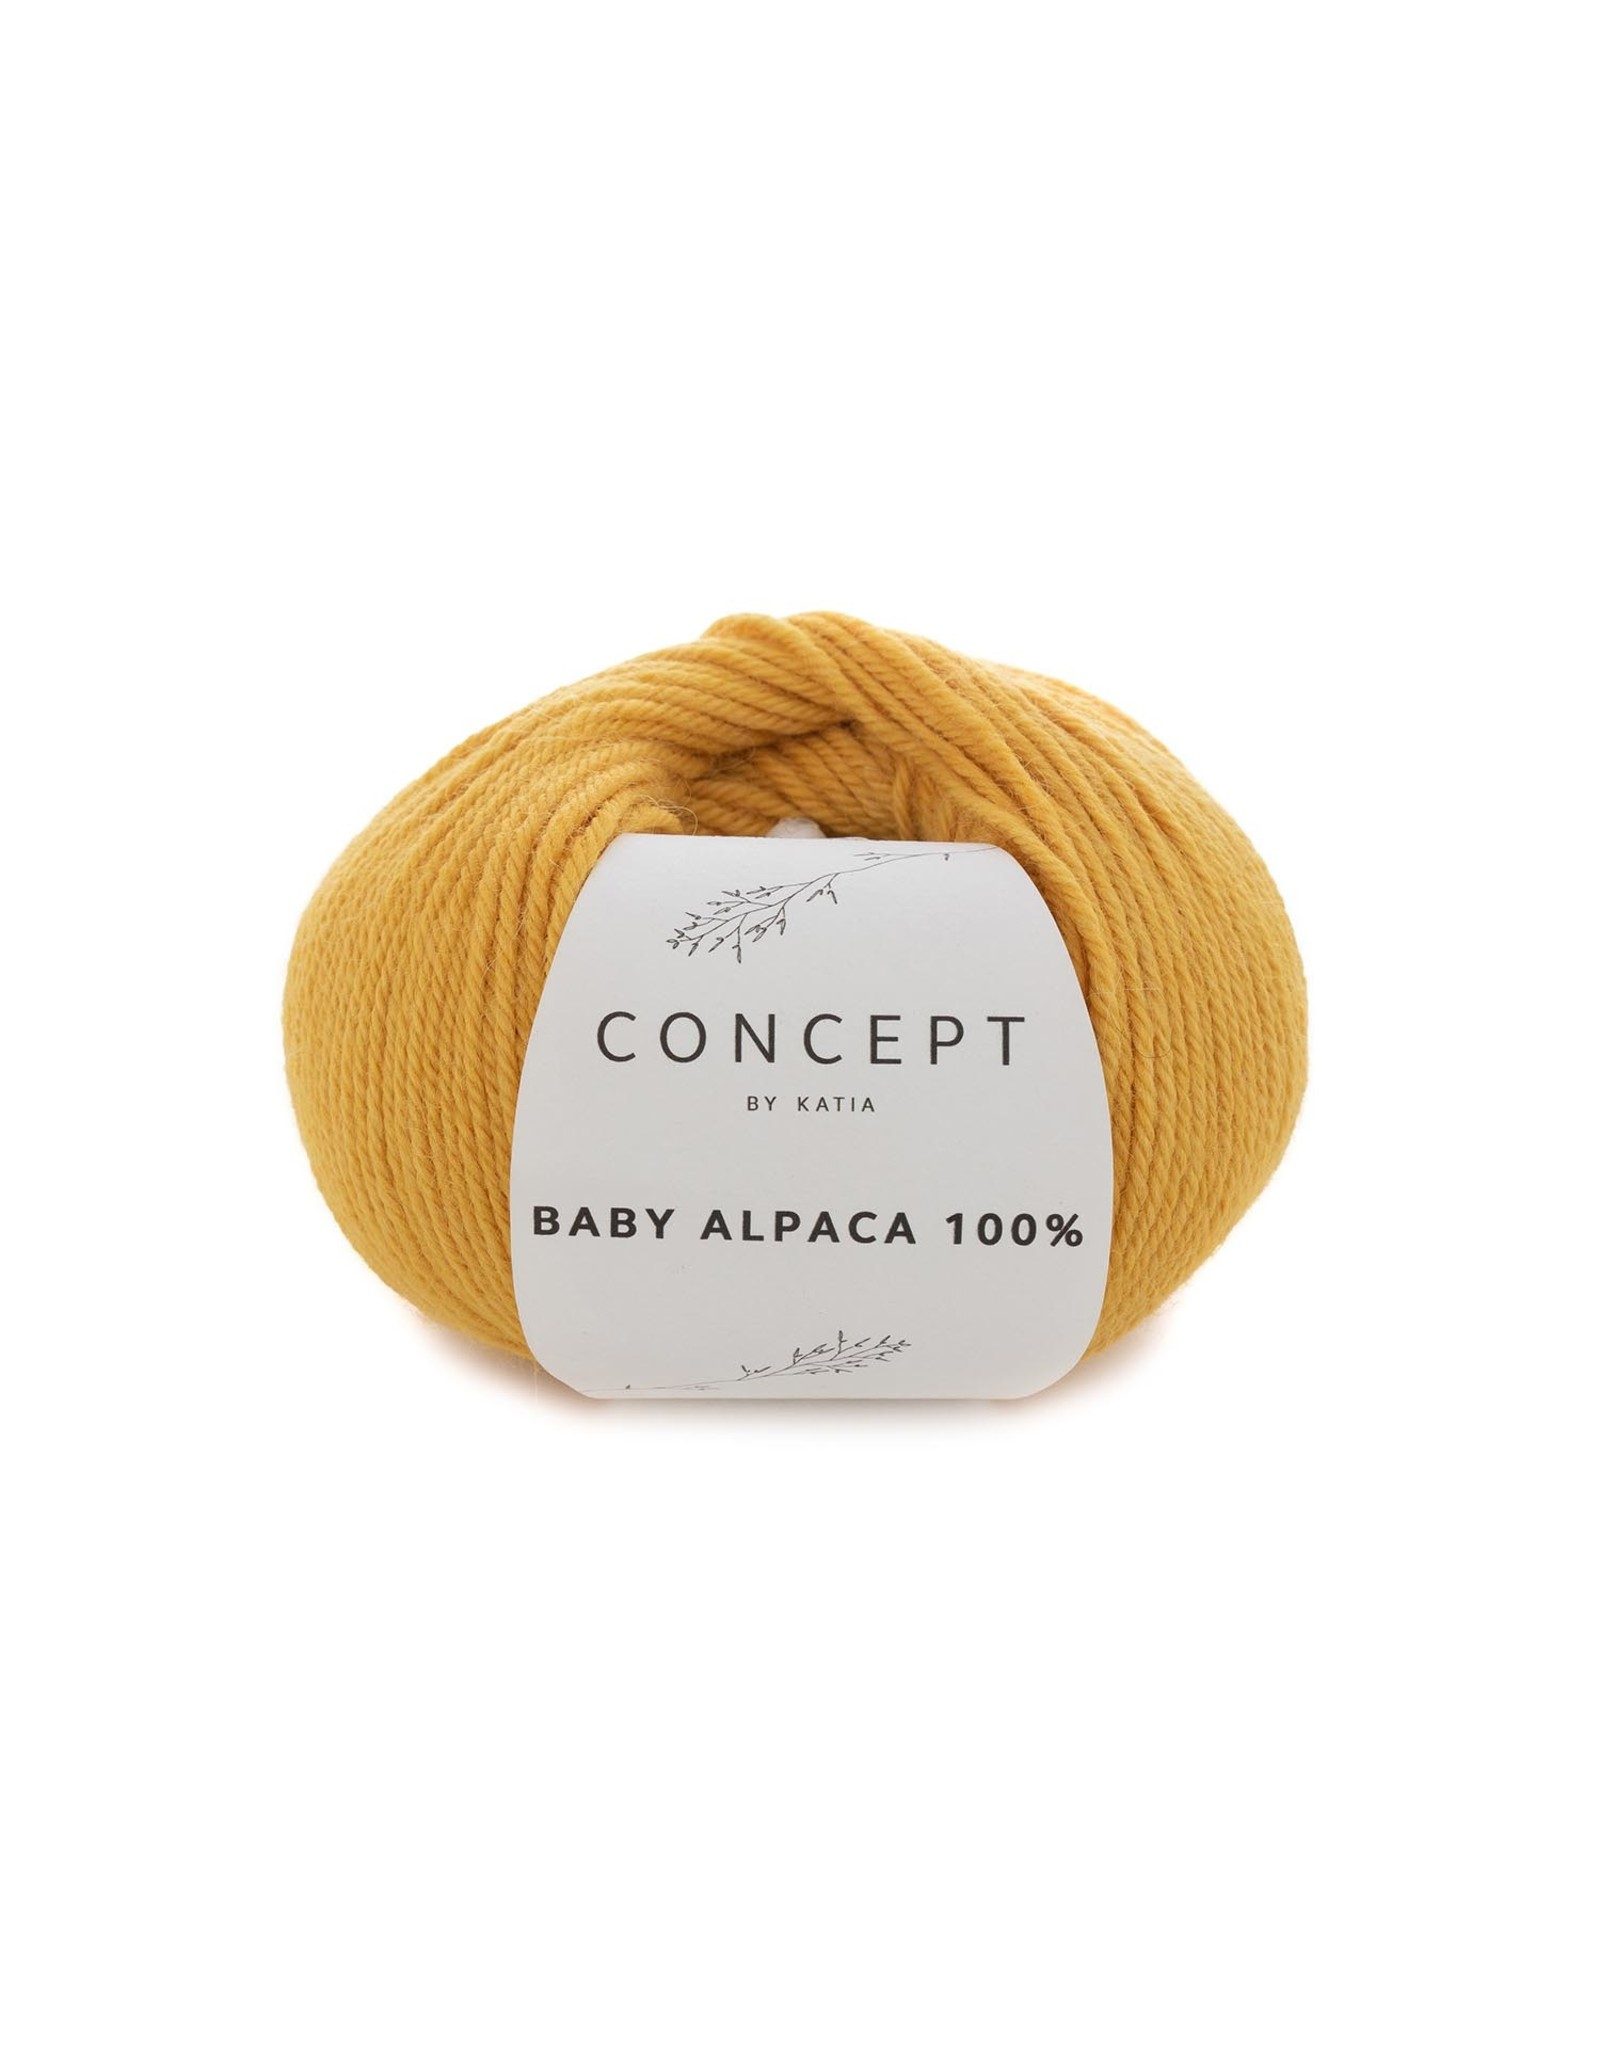 Katia Baby Alpaca 100% - kleur 521 - Geel - 50 gr. = 125 m. - 100% Baby Alpaca